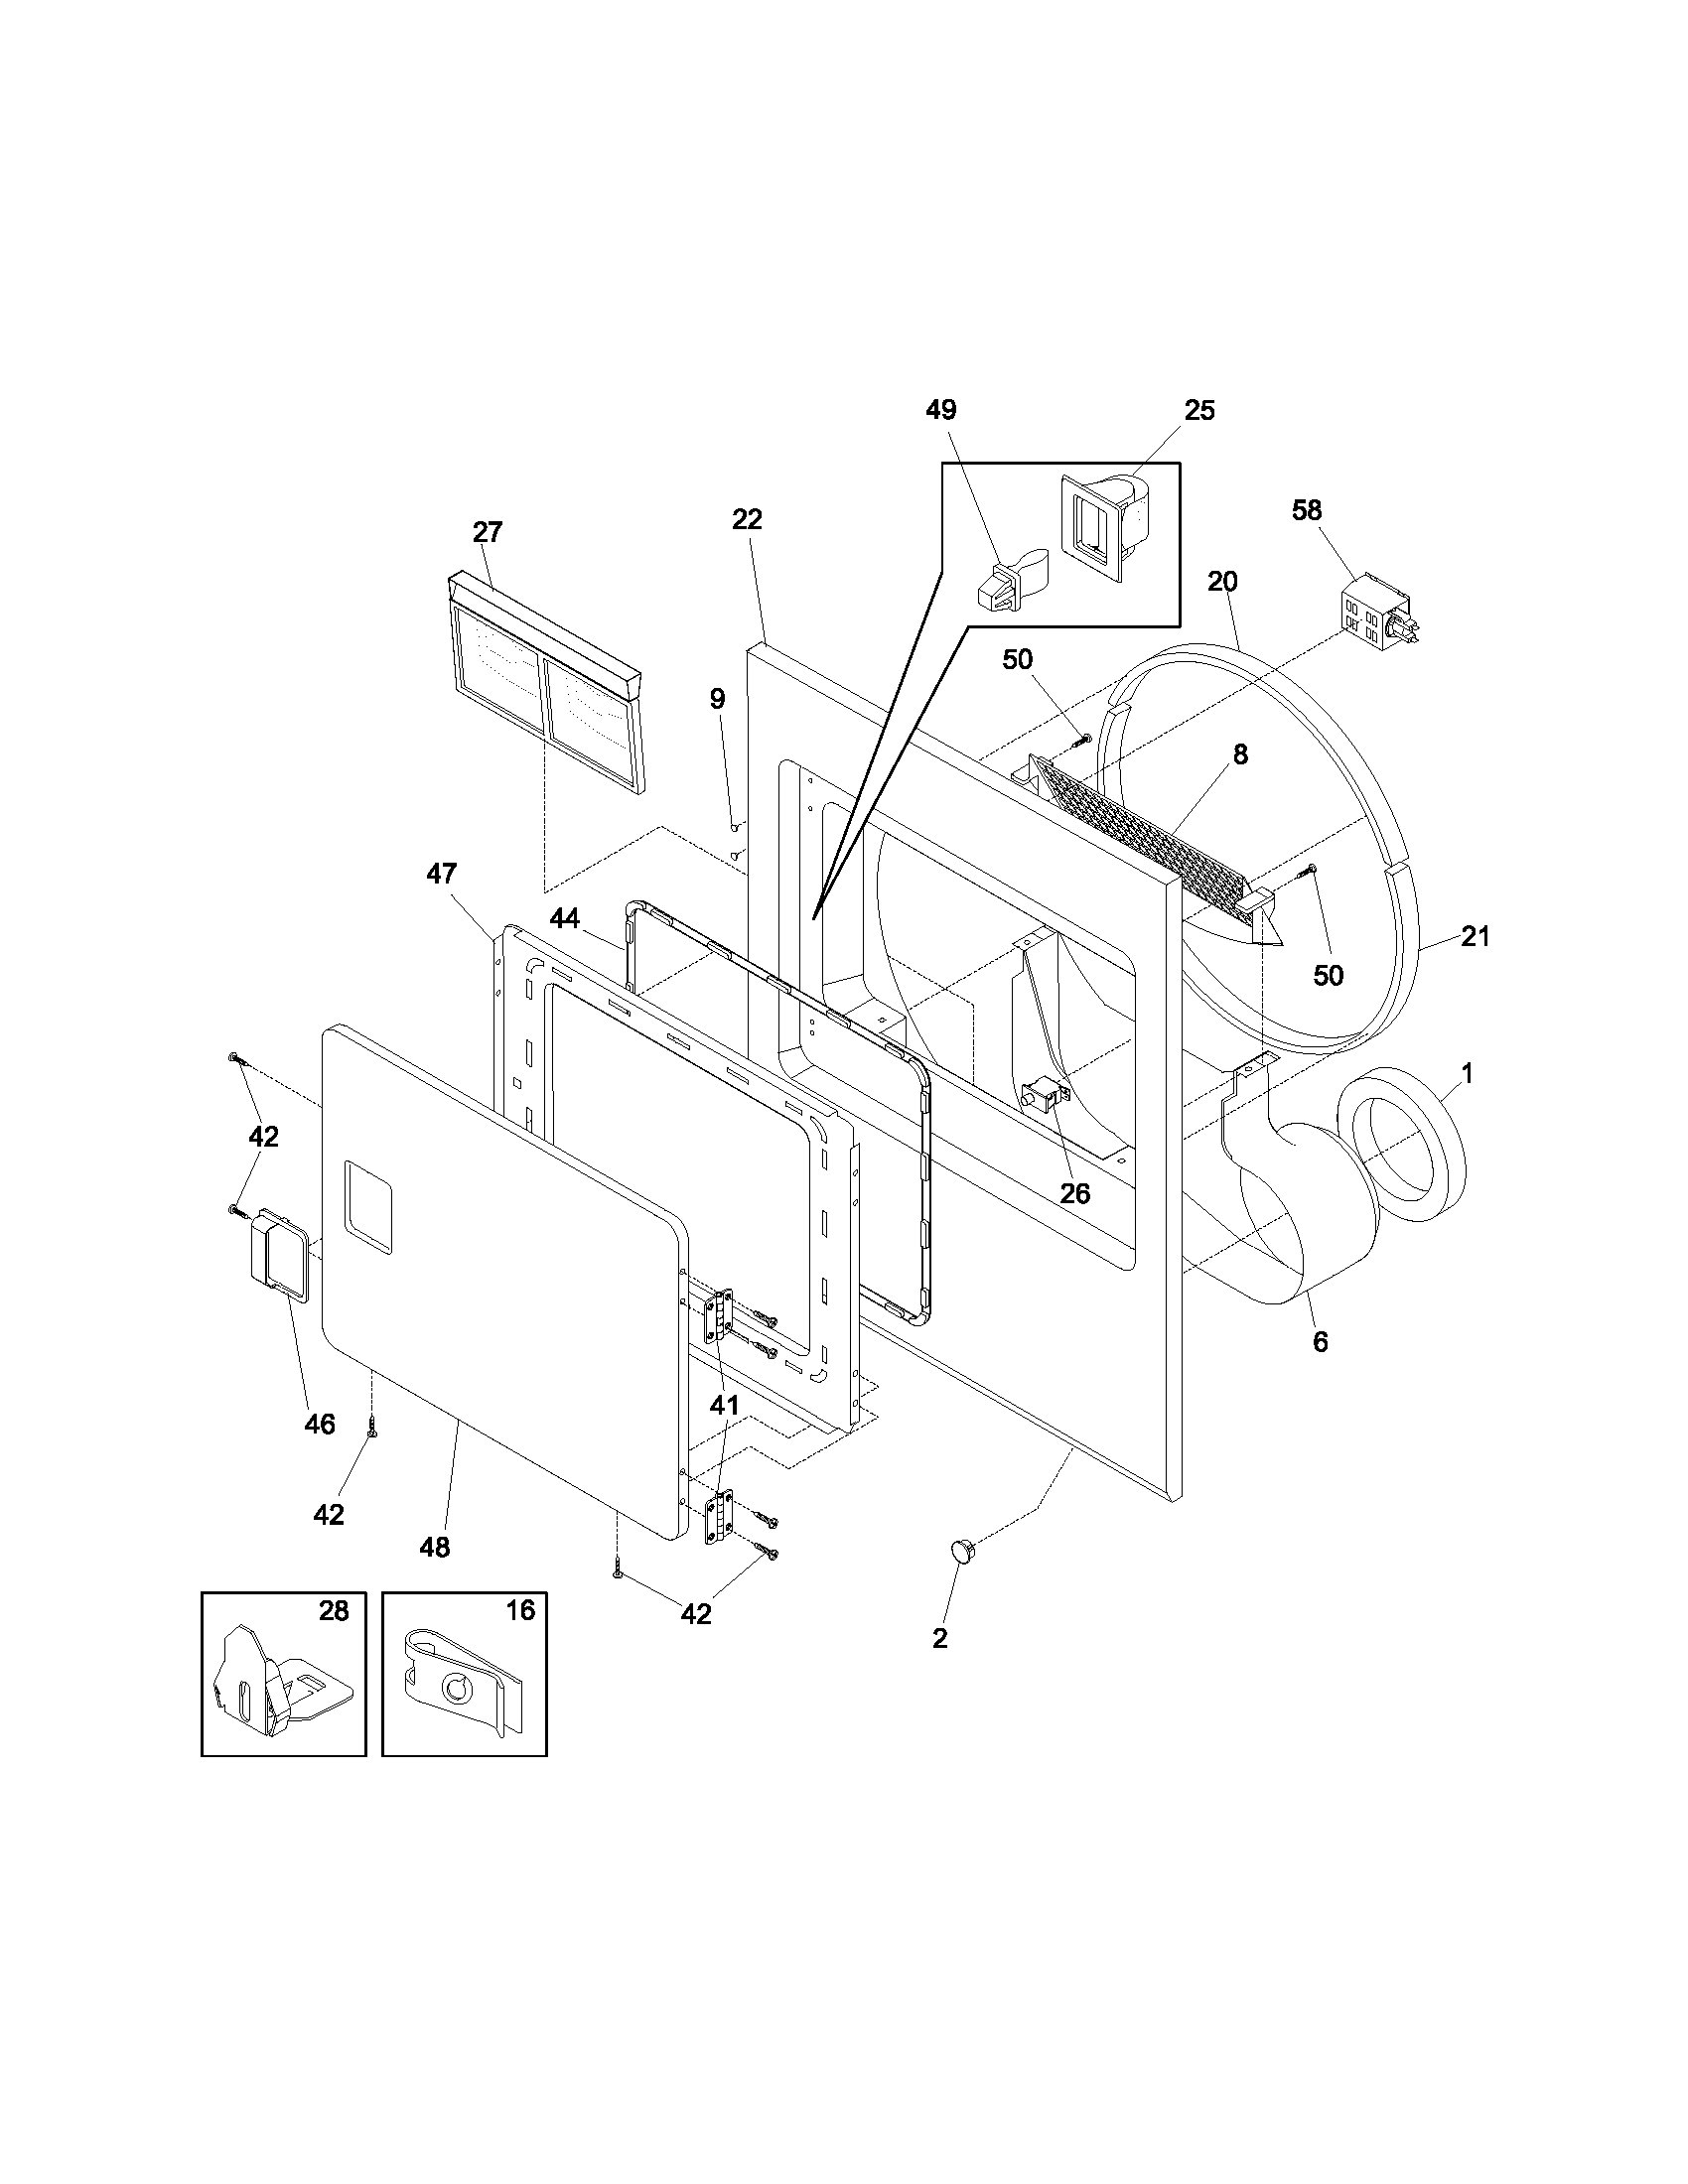 FRNT PNL,DOOR Diagram & Parts List for Model gler341as1